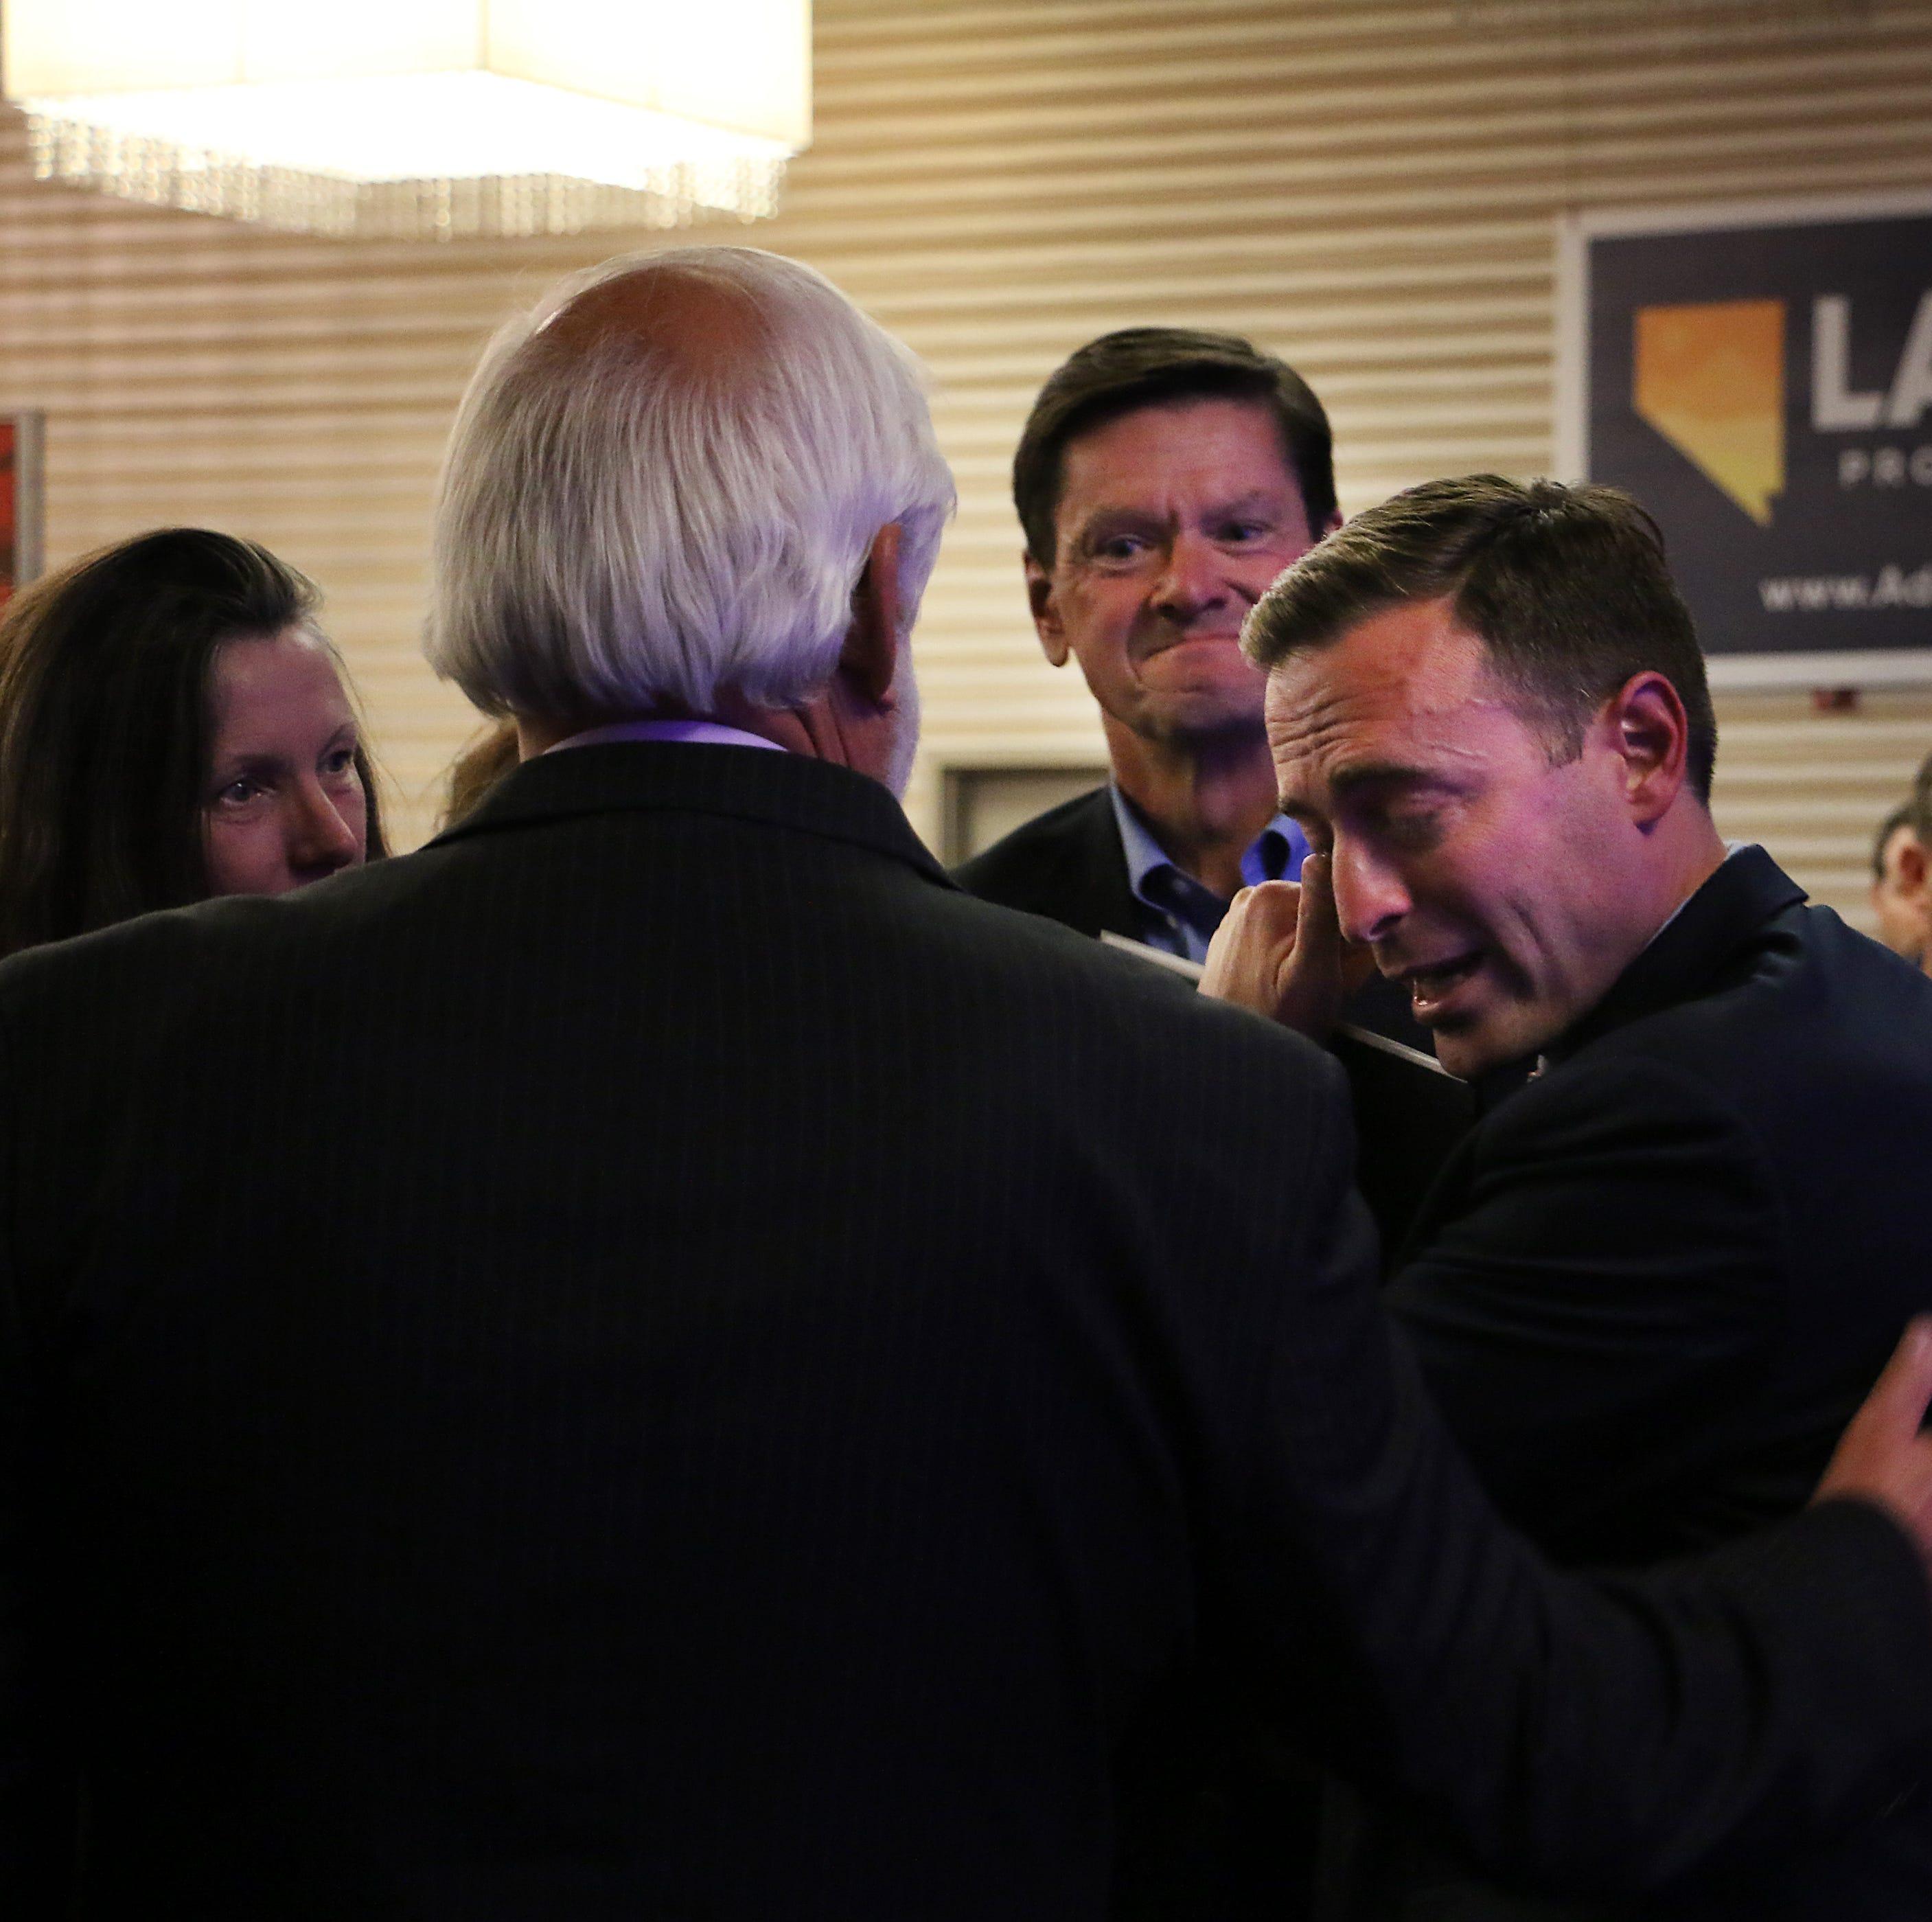 GOP former governor hopeful Laxalt announces new job with a Washington D.C.-based law firm